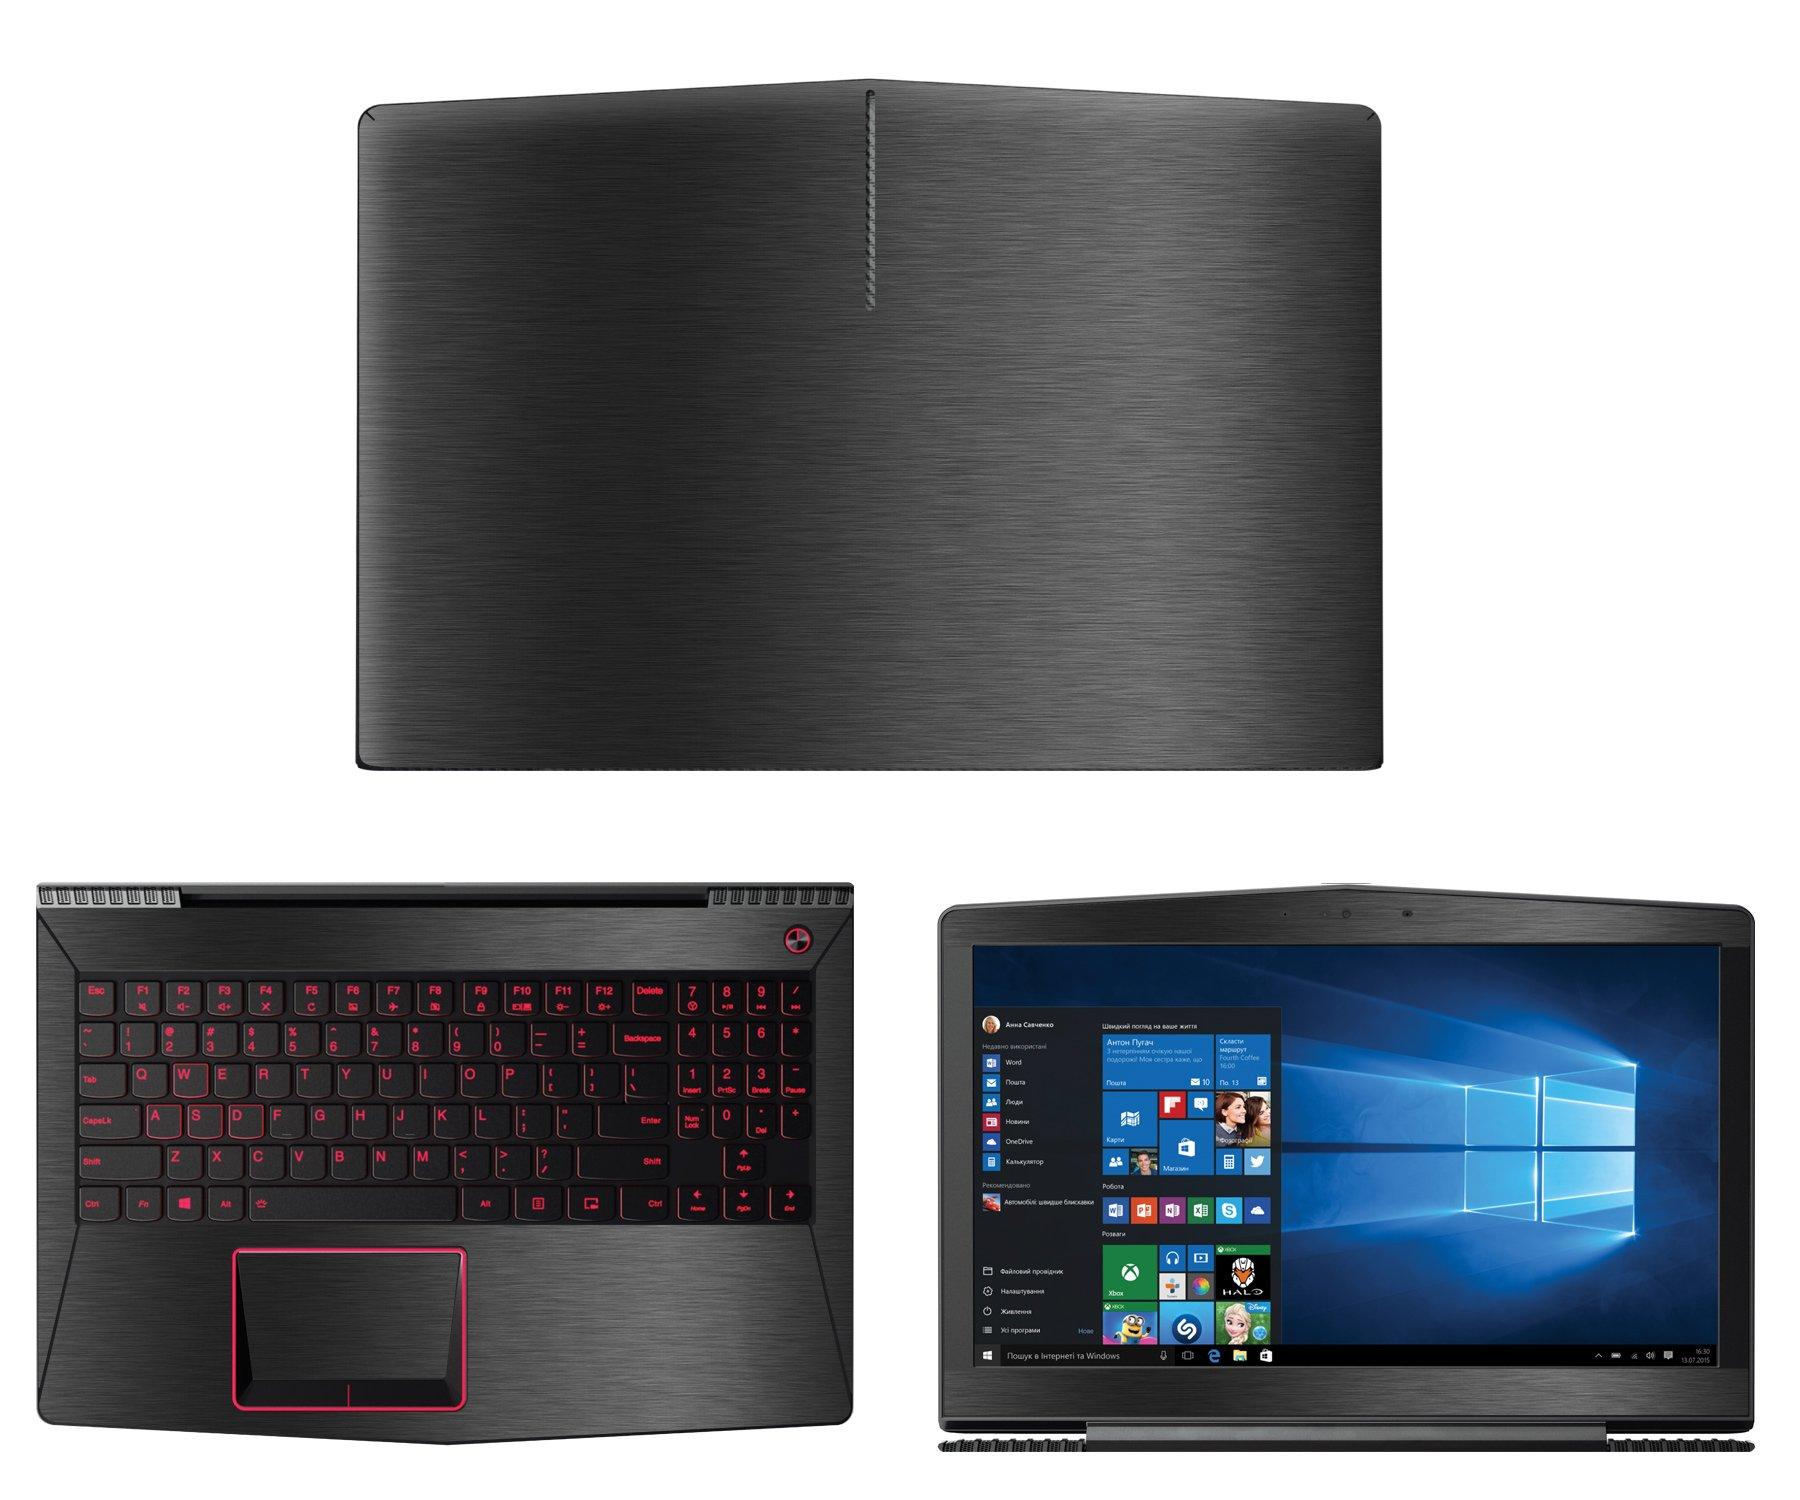 Decalrus - Protective decal for Lenovo LEGION Y520 (15.6'' Screen) Laptop Dark Grey Texture Brushed Aluminum skin case cover wrap BAlenovoLegionY520Dark Grey